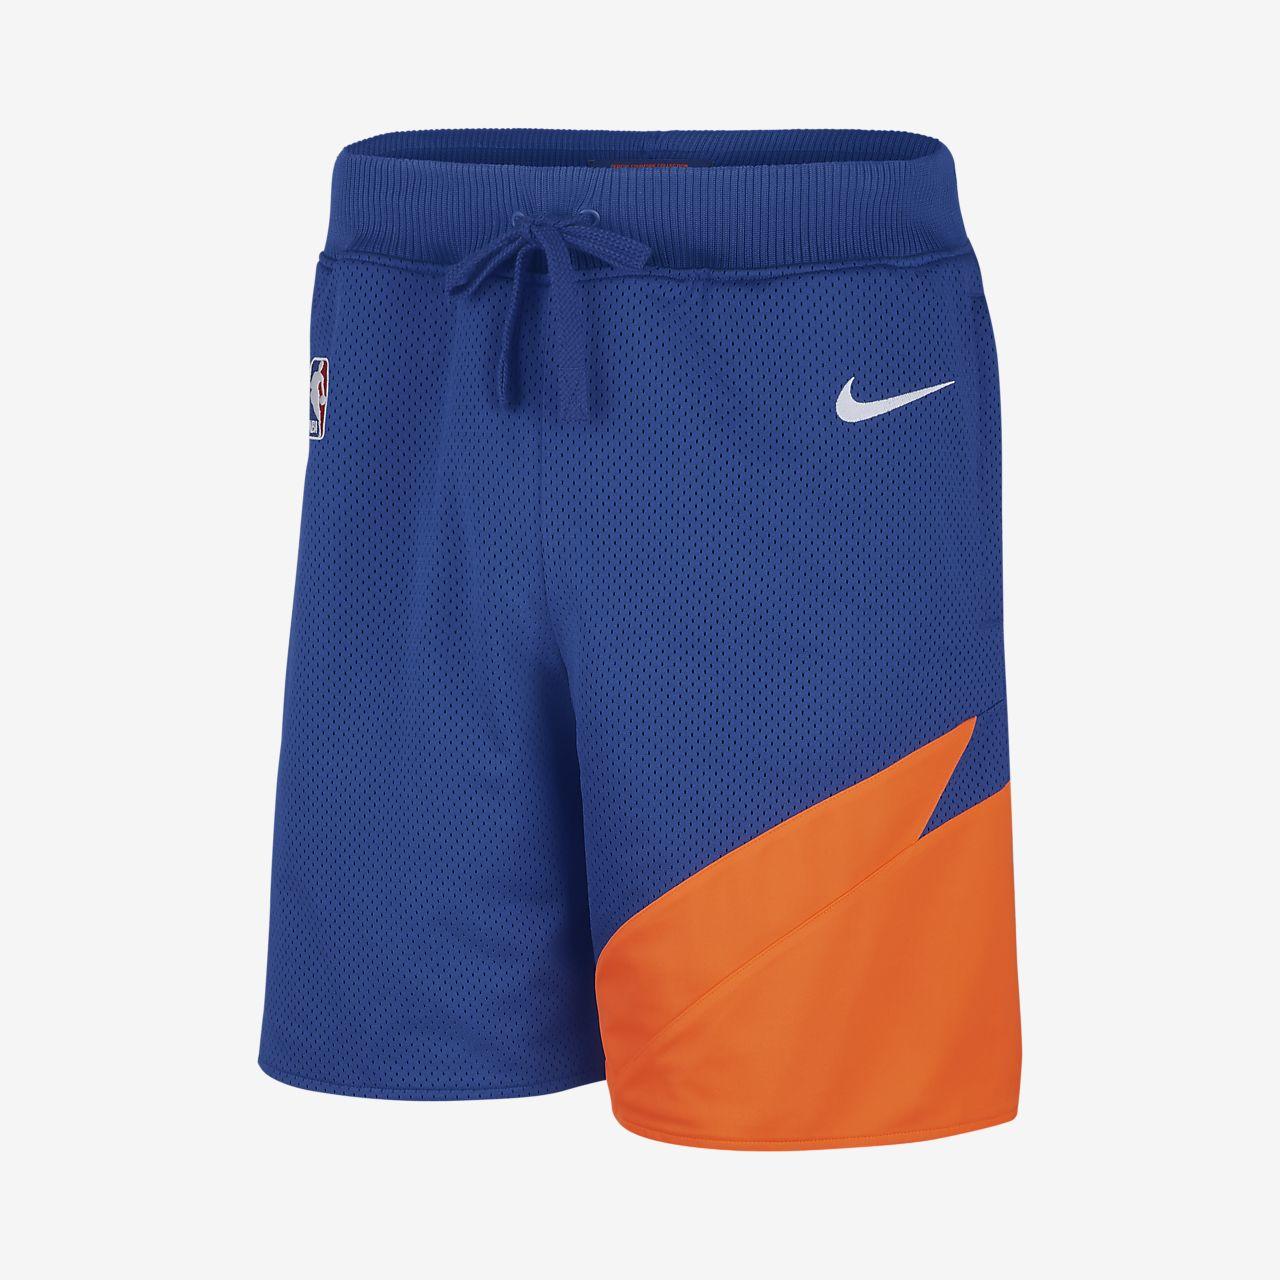 Cleveland Cavaliers Nike Courtside Pantalón corto de la NBA - Hombre